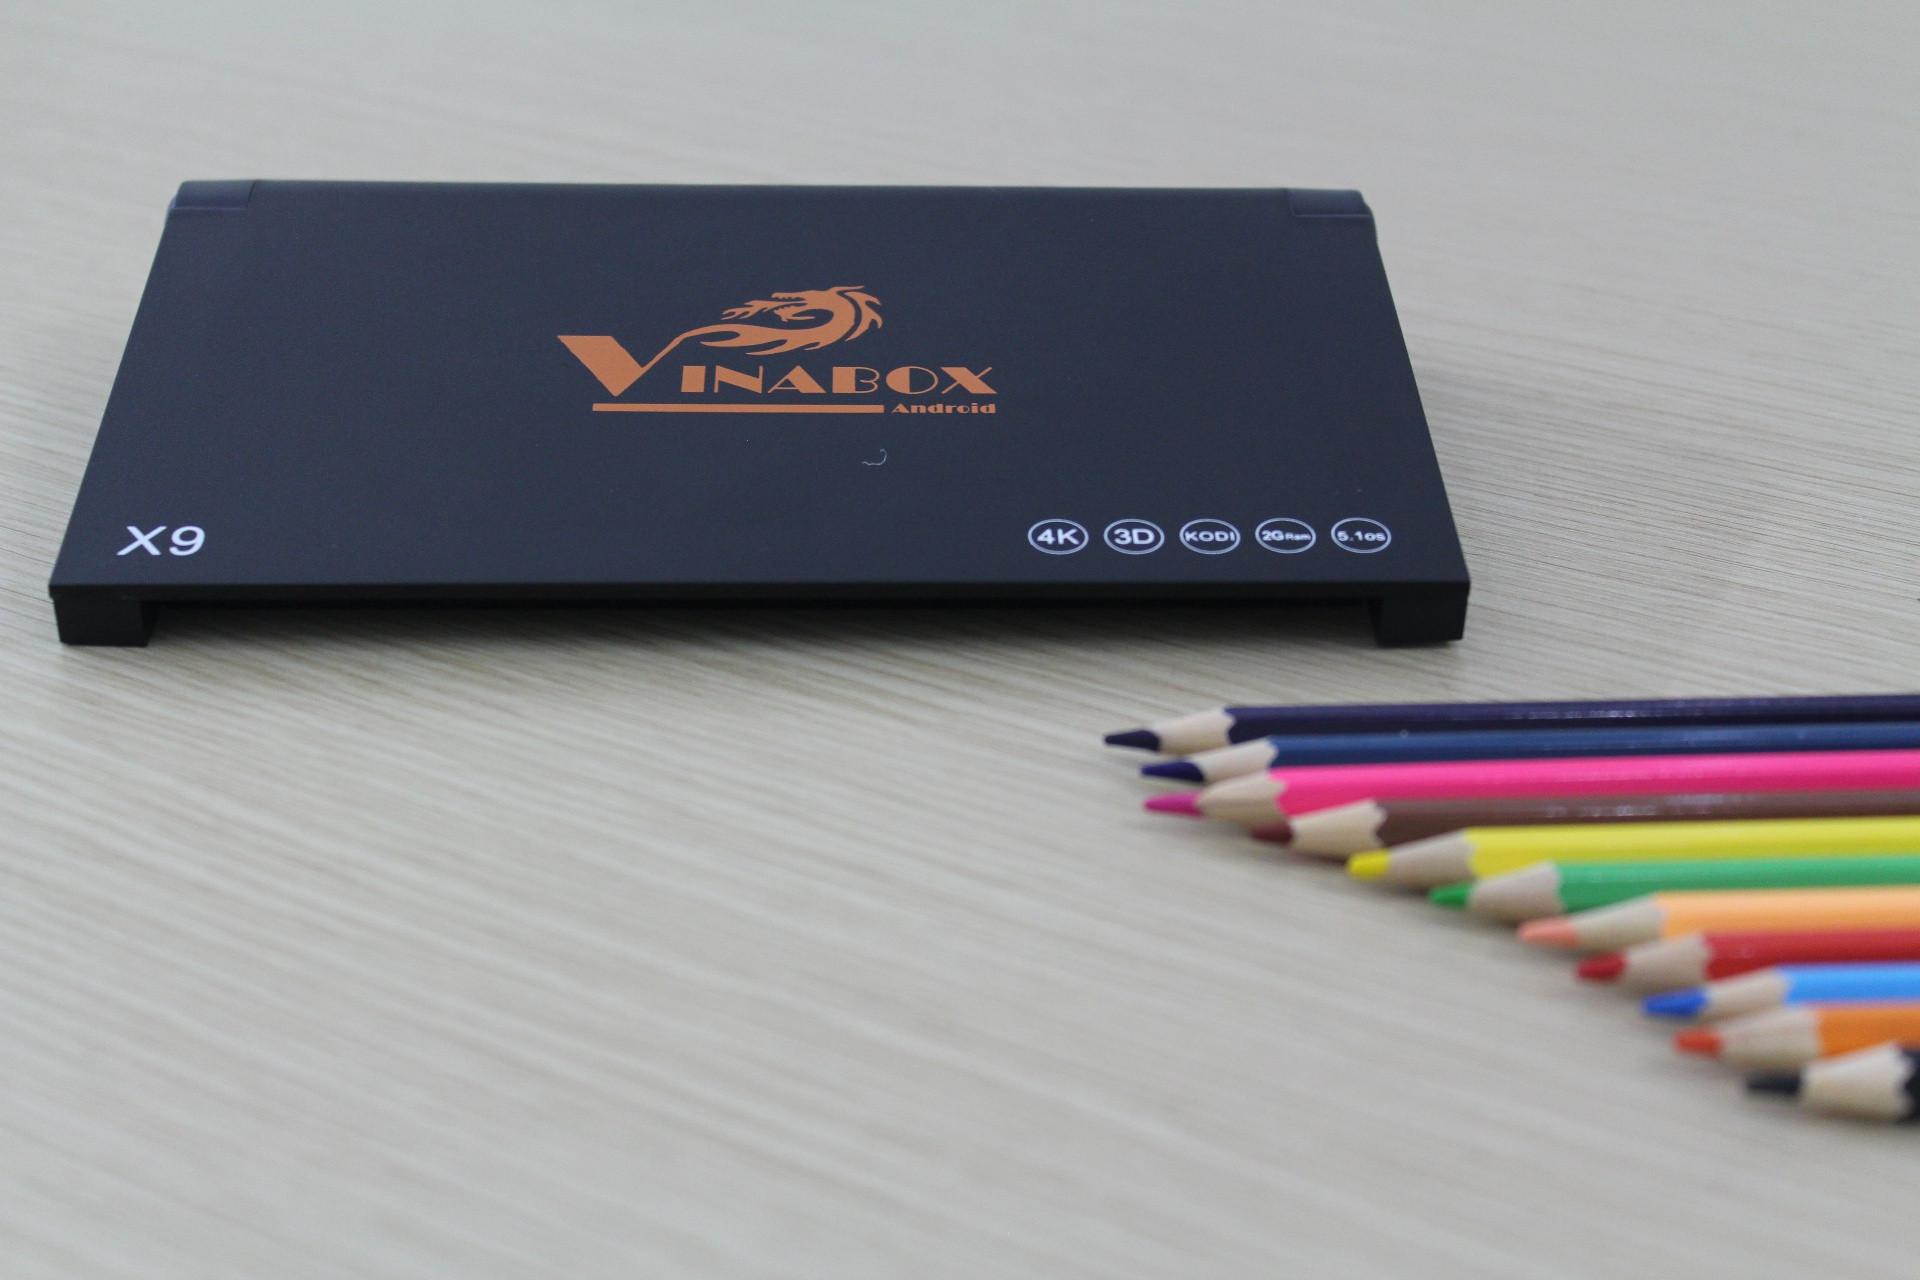 Android Tivi Box Vinabox X9- RAM 2GB + Tặng 1 chuột bay KM800 3